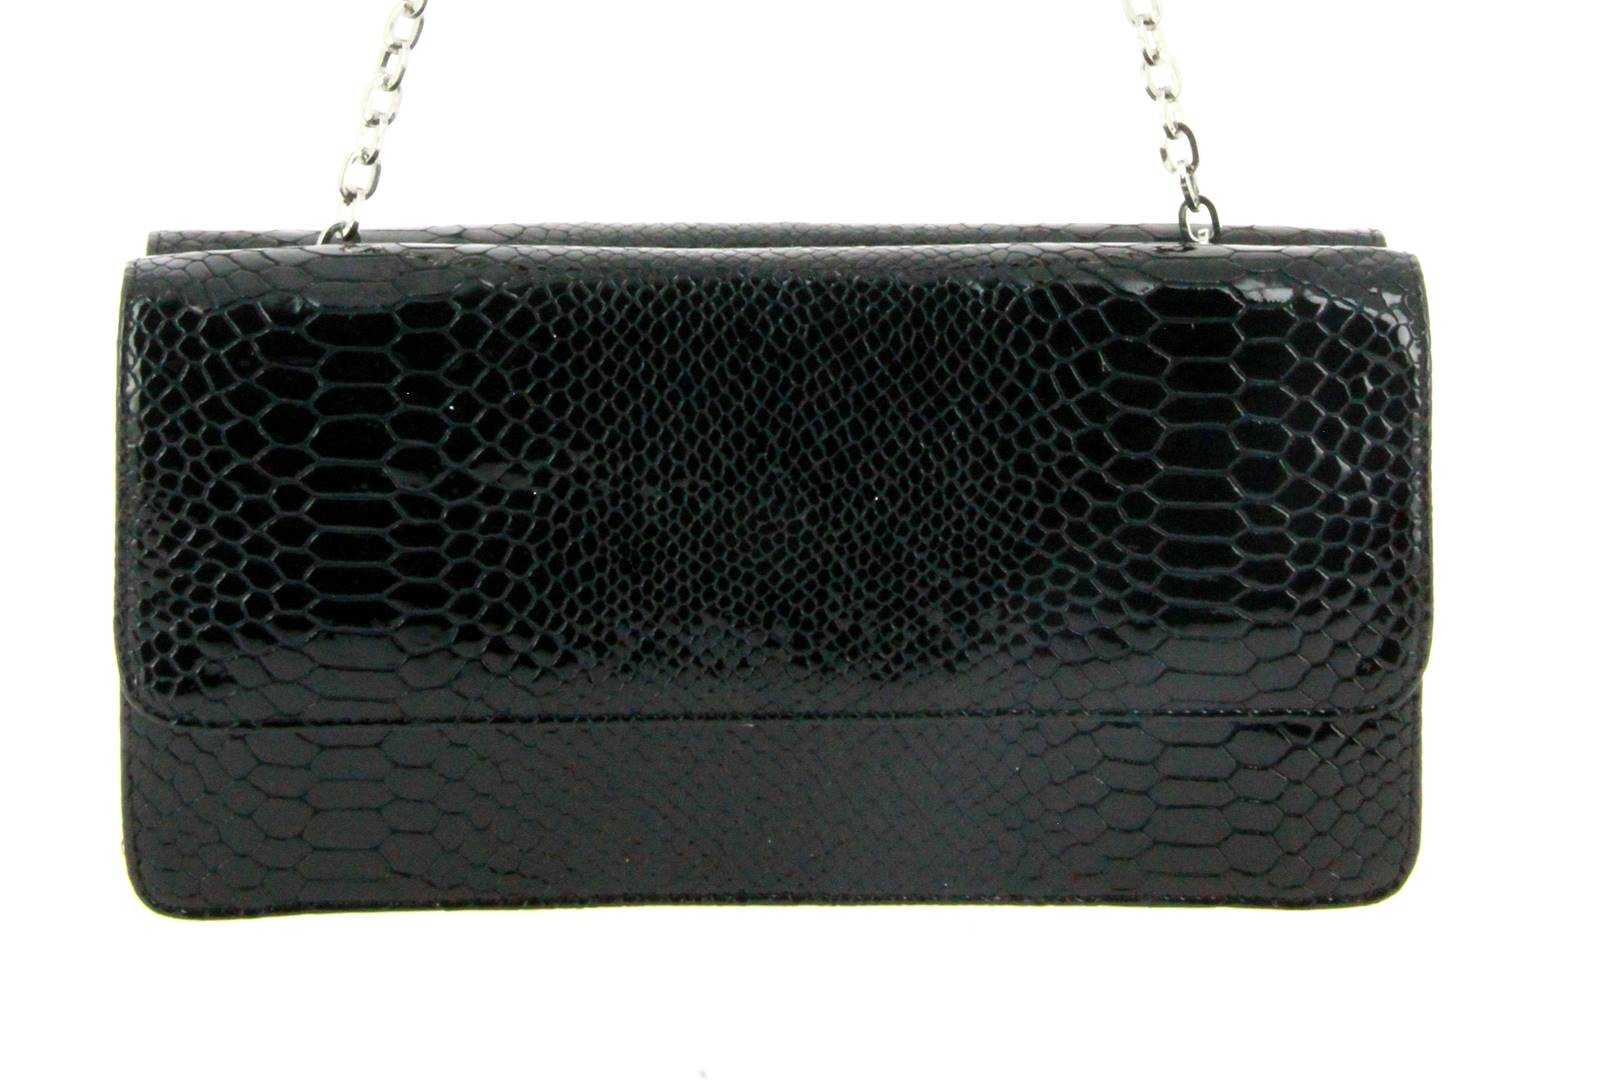 Stuart Weitzman bag DUPLEX BLACK CRYSTAL SNAKE